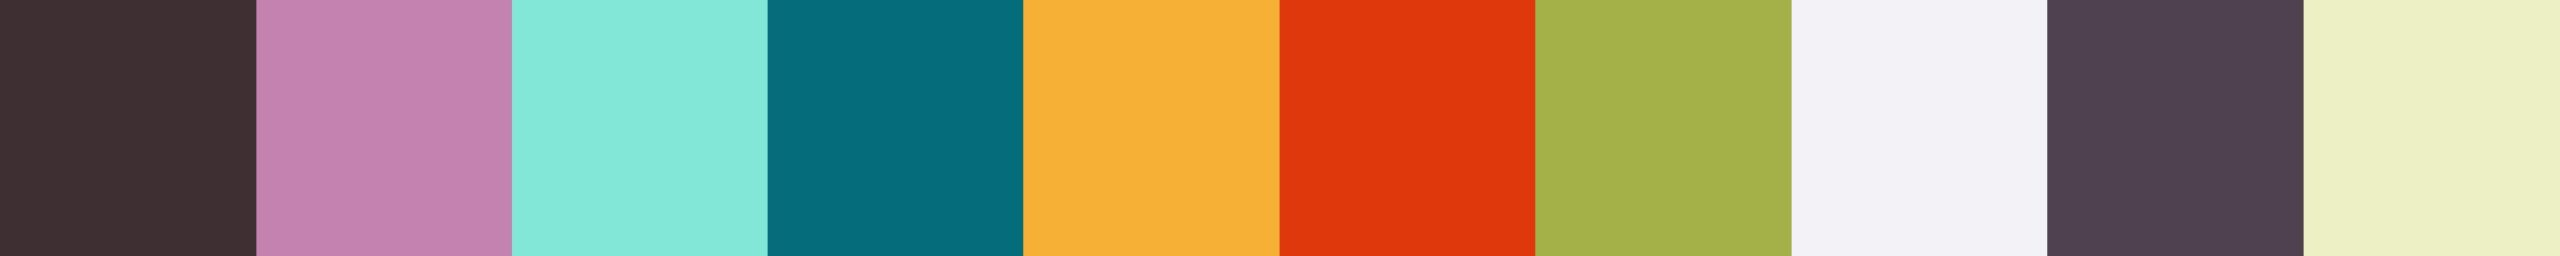 349 Nemolinga Color Palette